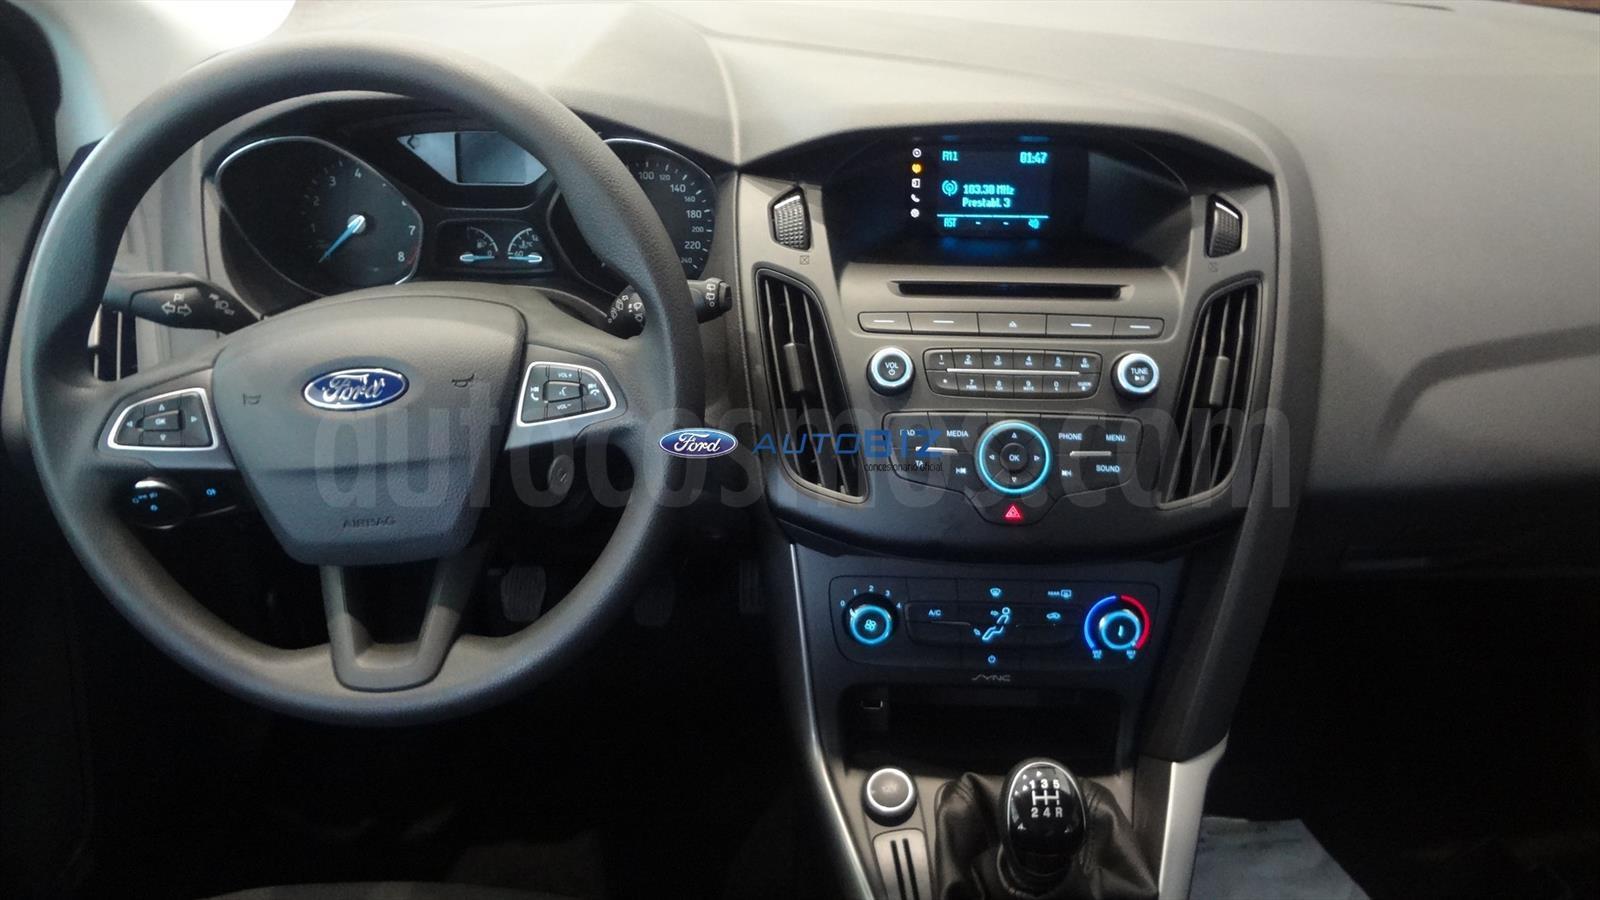 Venta Autos Nuevo Buenos Aires Gba Ford Focus 5p 1 6l S